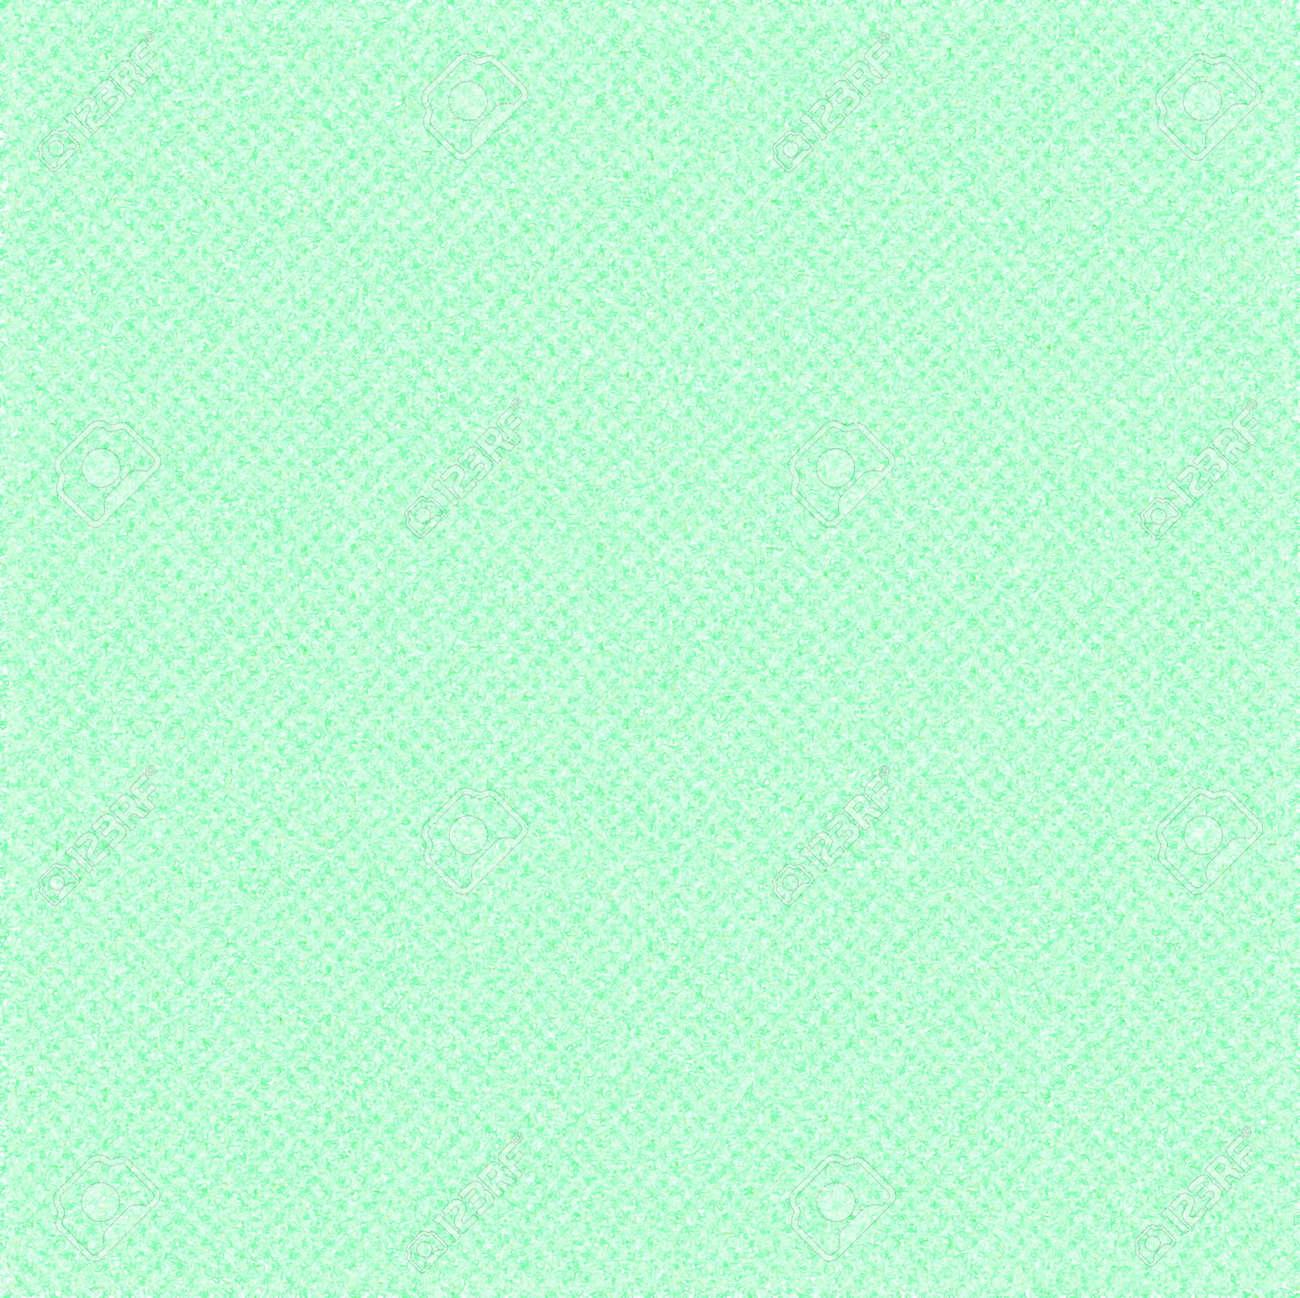 Sfondi Verde Acqua Pastello Sfondi